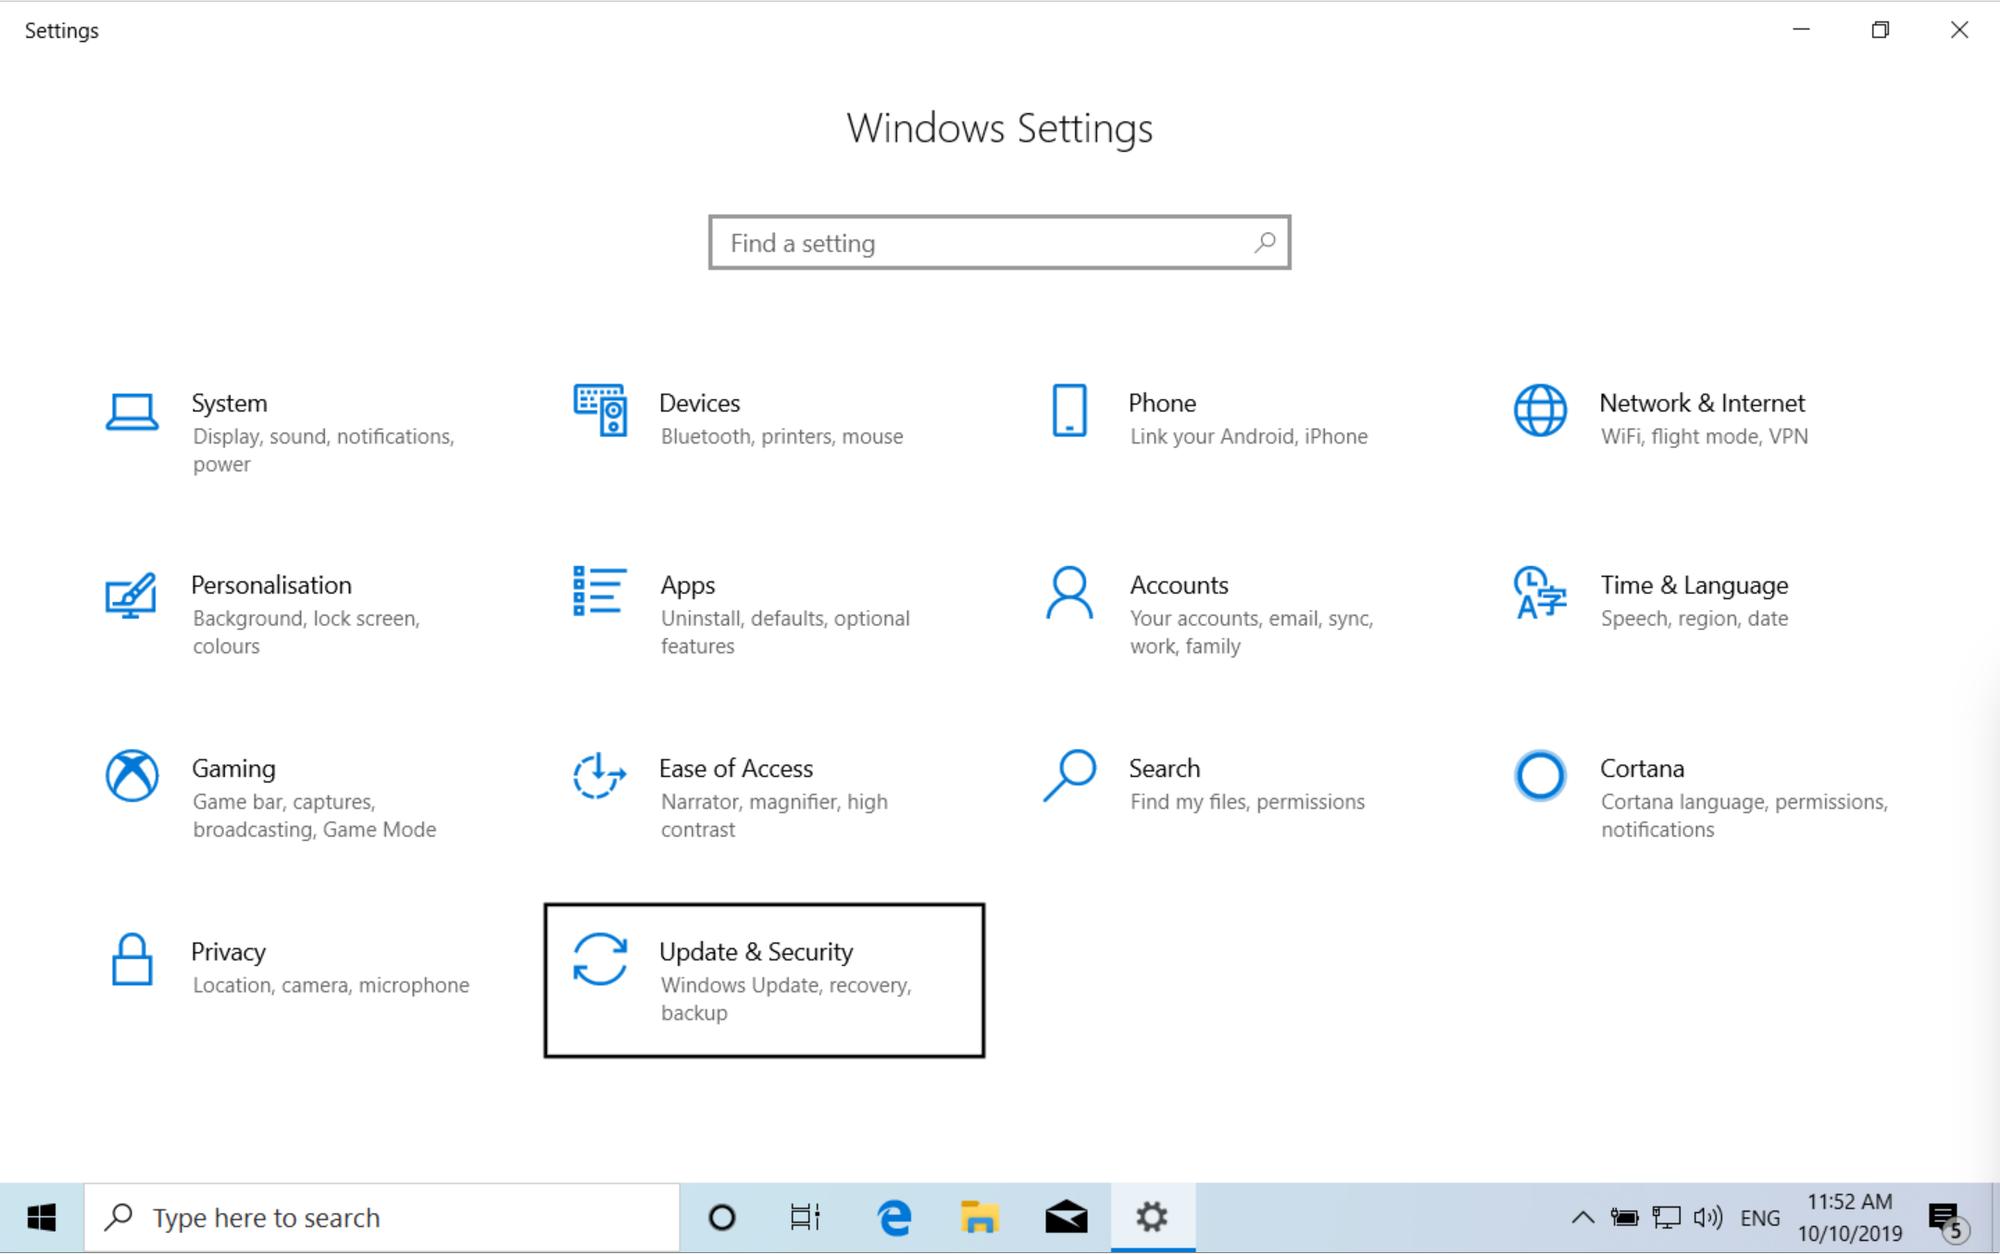 How to Install the Latest Windows 10 Feature Update Using Windows Update 3fe1ffbc-0686-4b38-9e53-c1b097727cff?upload=true.png